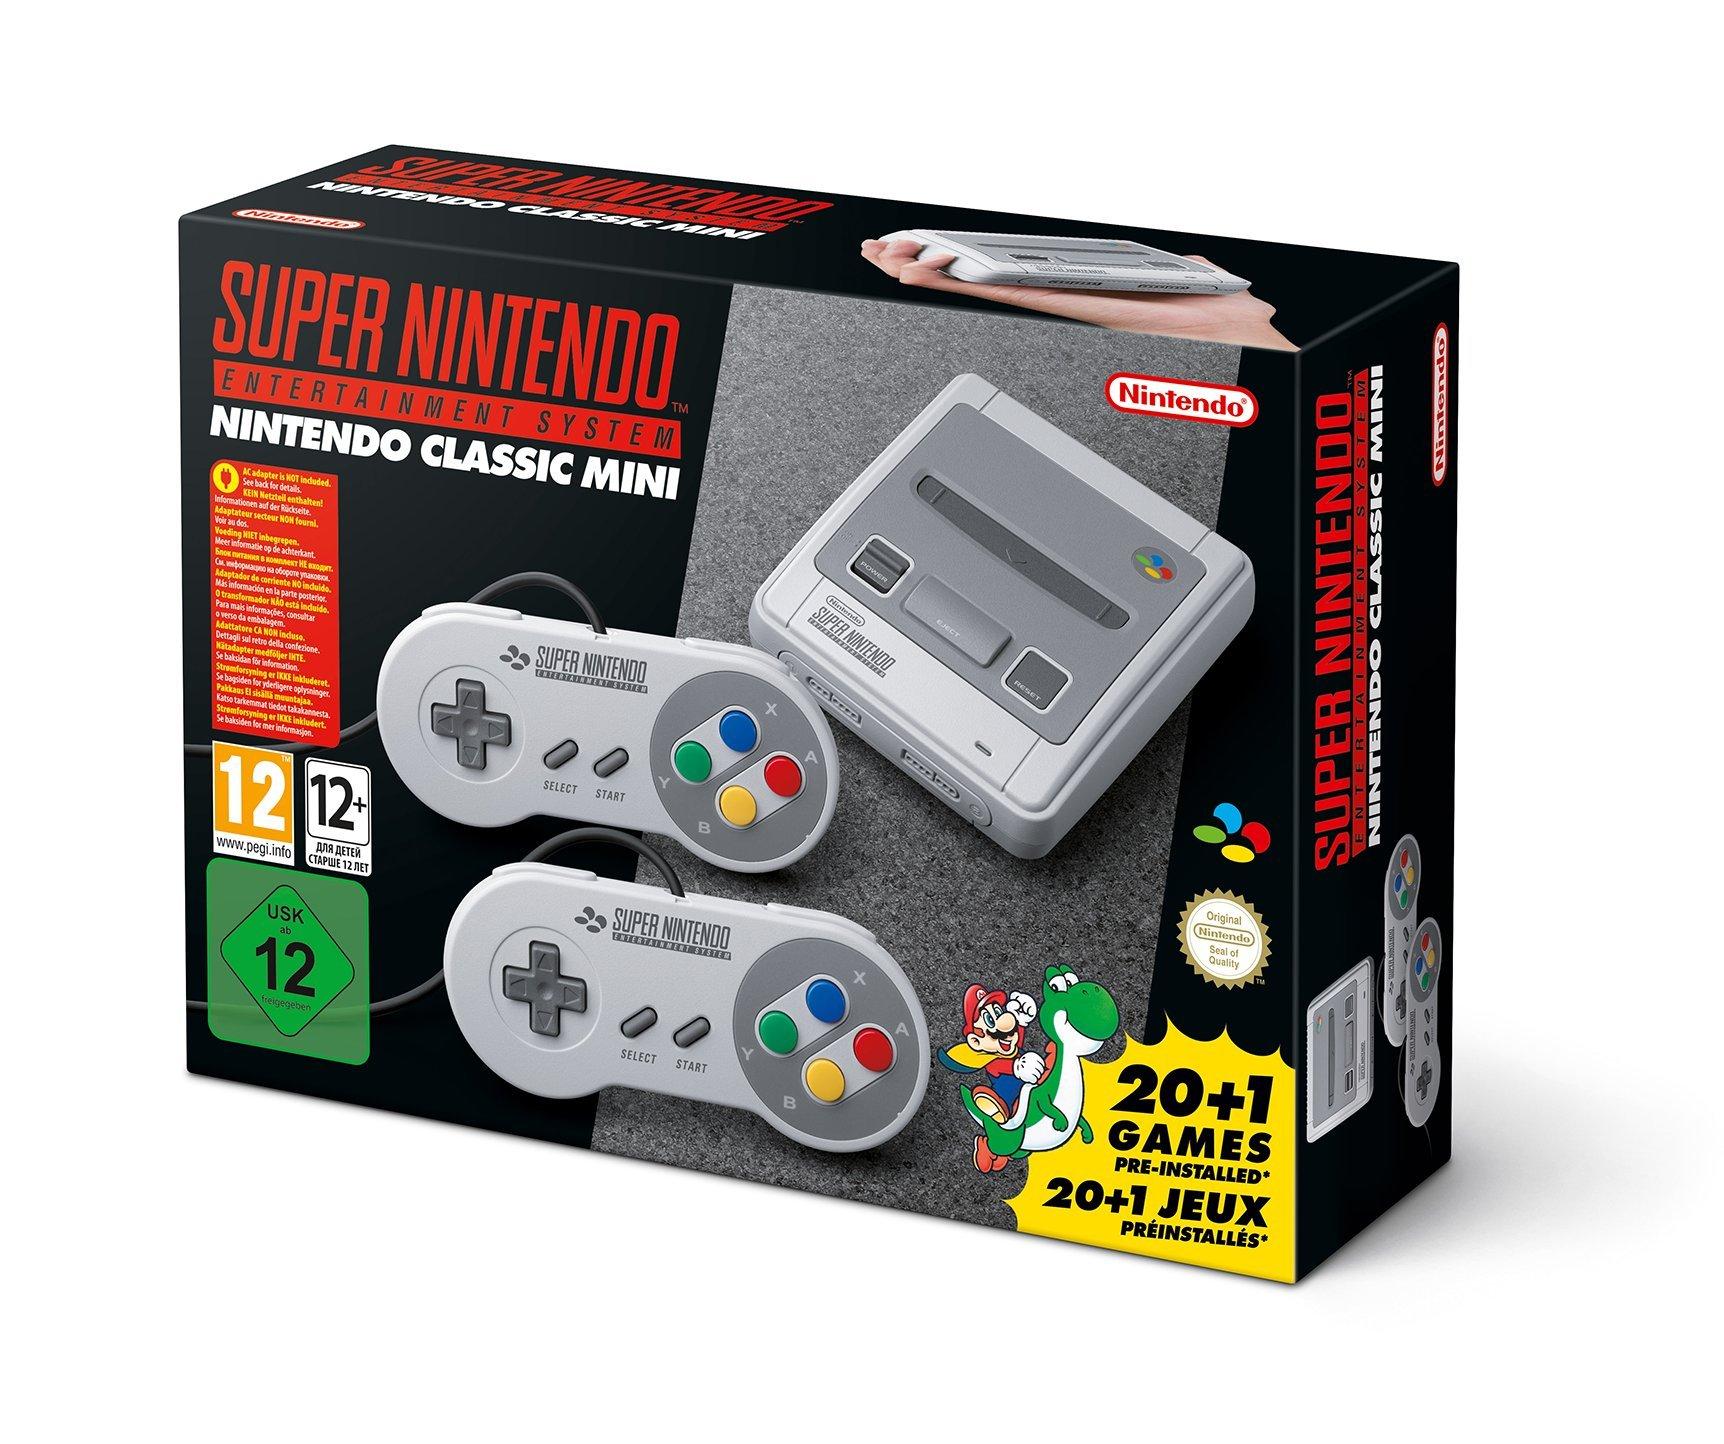 SNES Nintendo Classic Mini: Super Nintendo Entertainment System (Europe), Not Region Locked by Nintendo (Image #1)